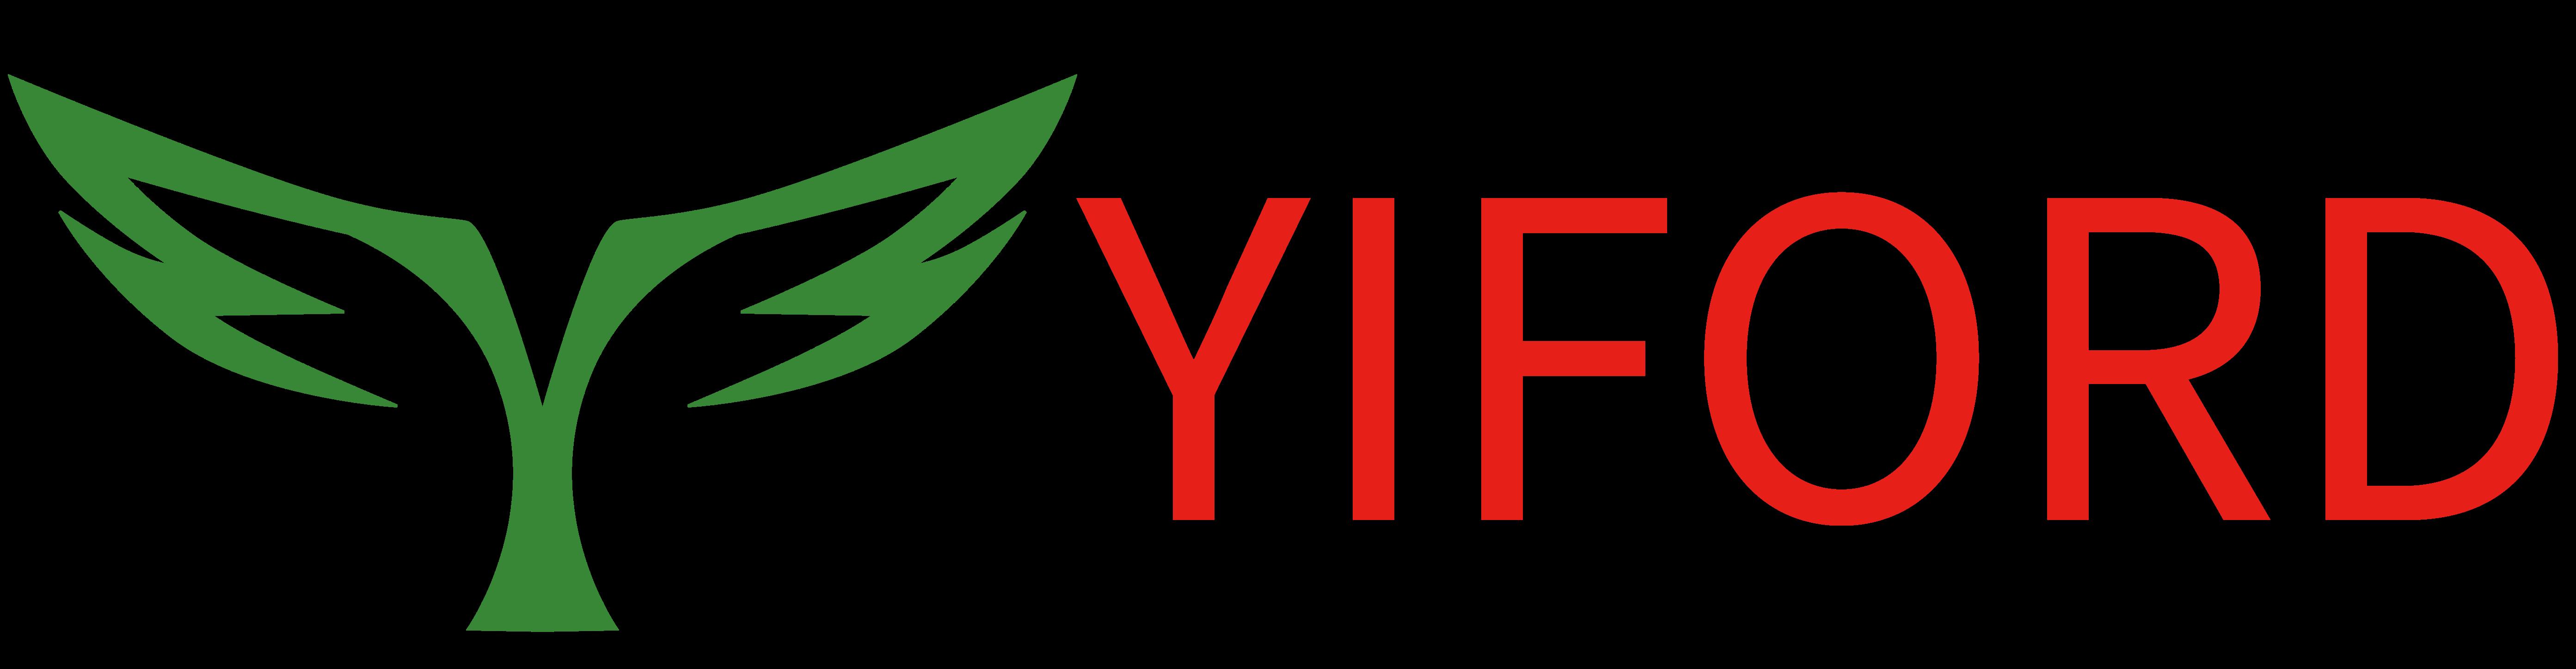 Tecnología Co., Ltd. de Yiford